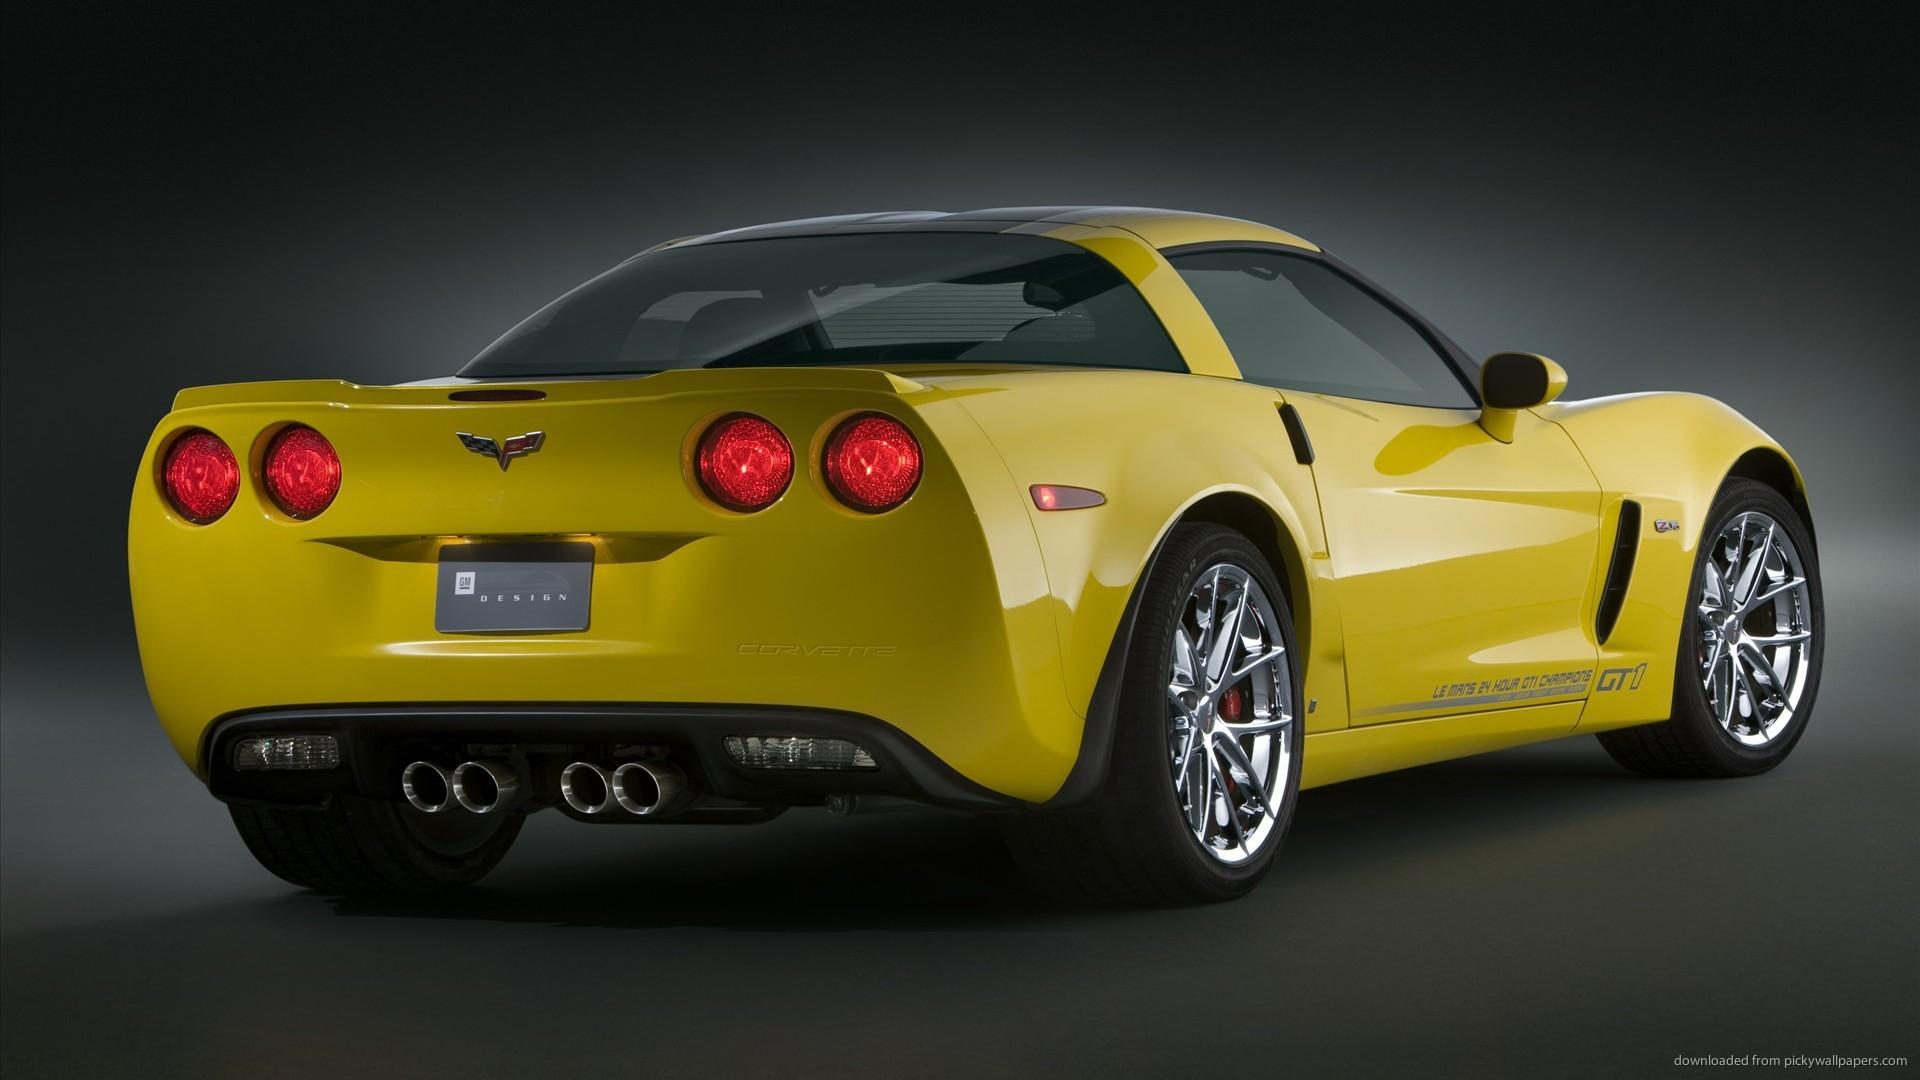 chevrolet yellow corvette wallpapers cars wallpaper 1920×1080